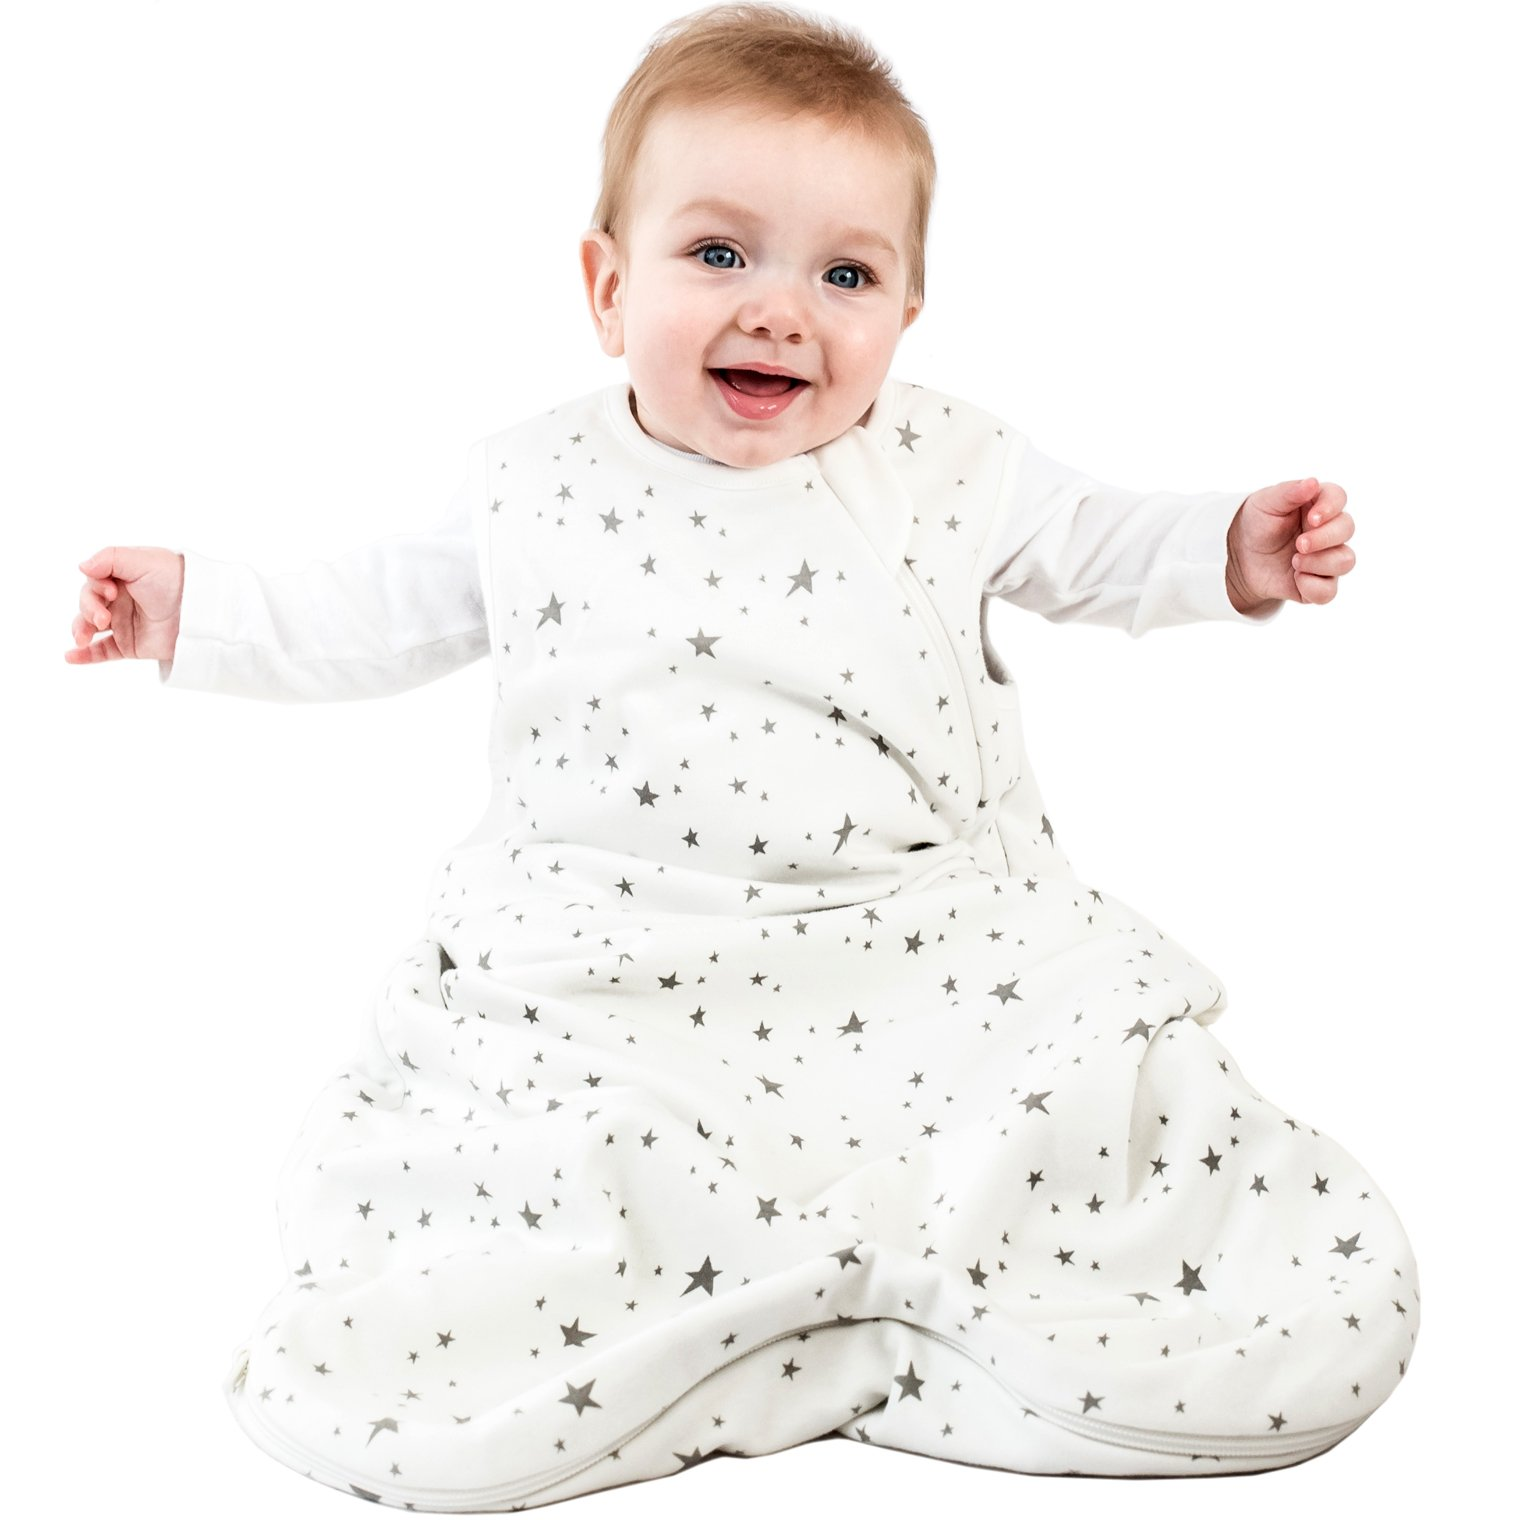 Woolino 4 Season Basic Baby Sleeping Bag, 6-18 Months, Australian Merino Wool, Stars